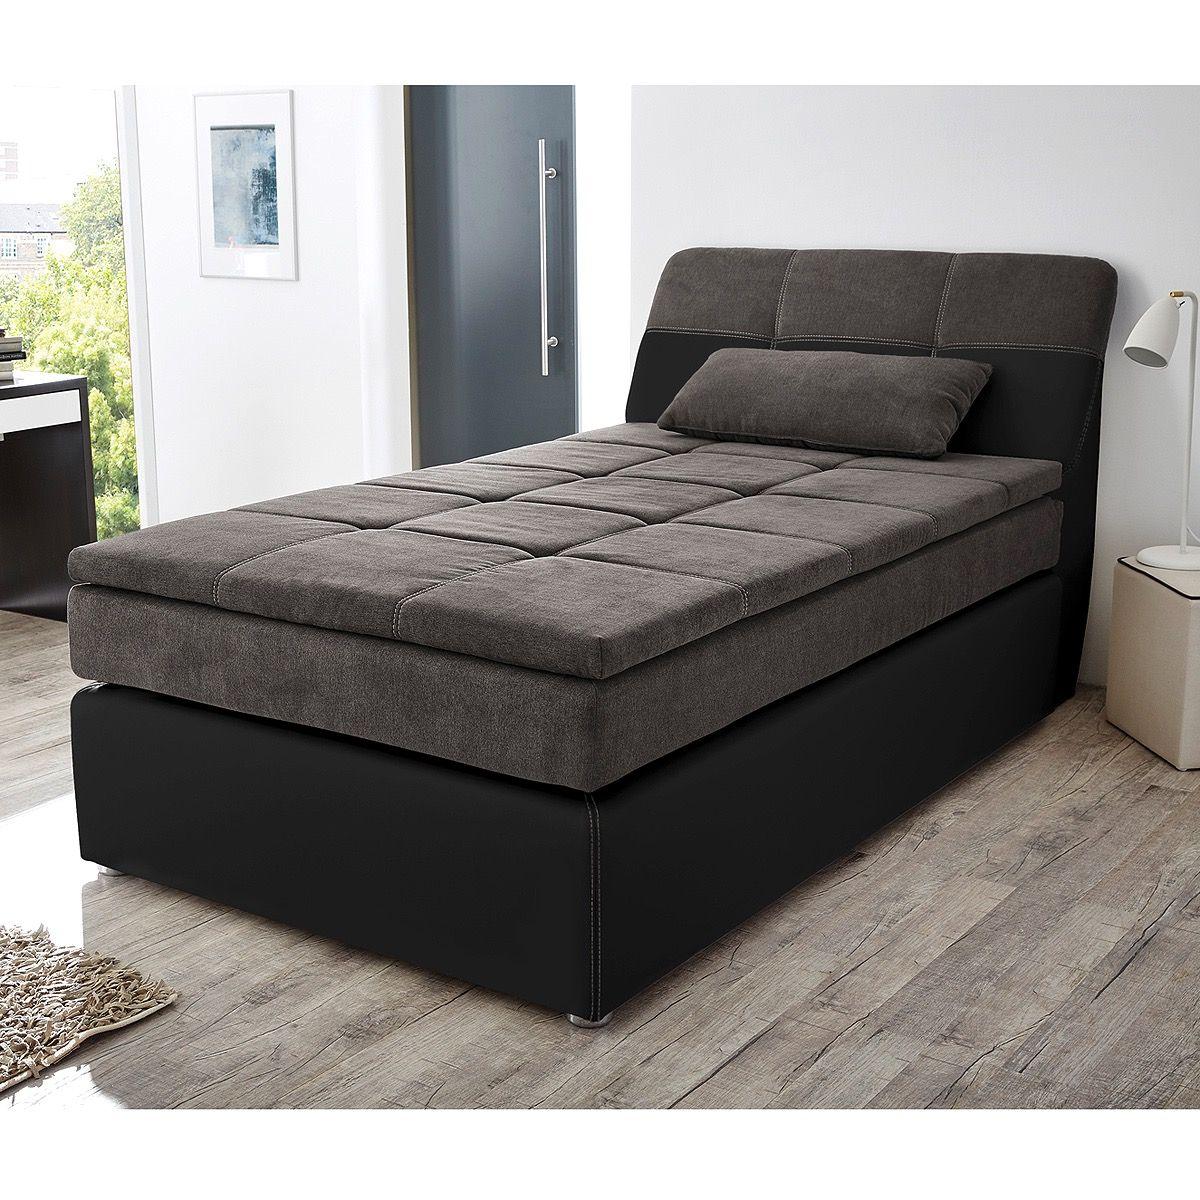 bett 120x200 schwarz Bett, Boxspringbett und Bett 120x200